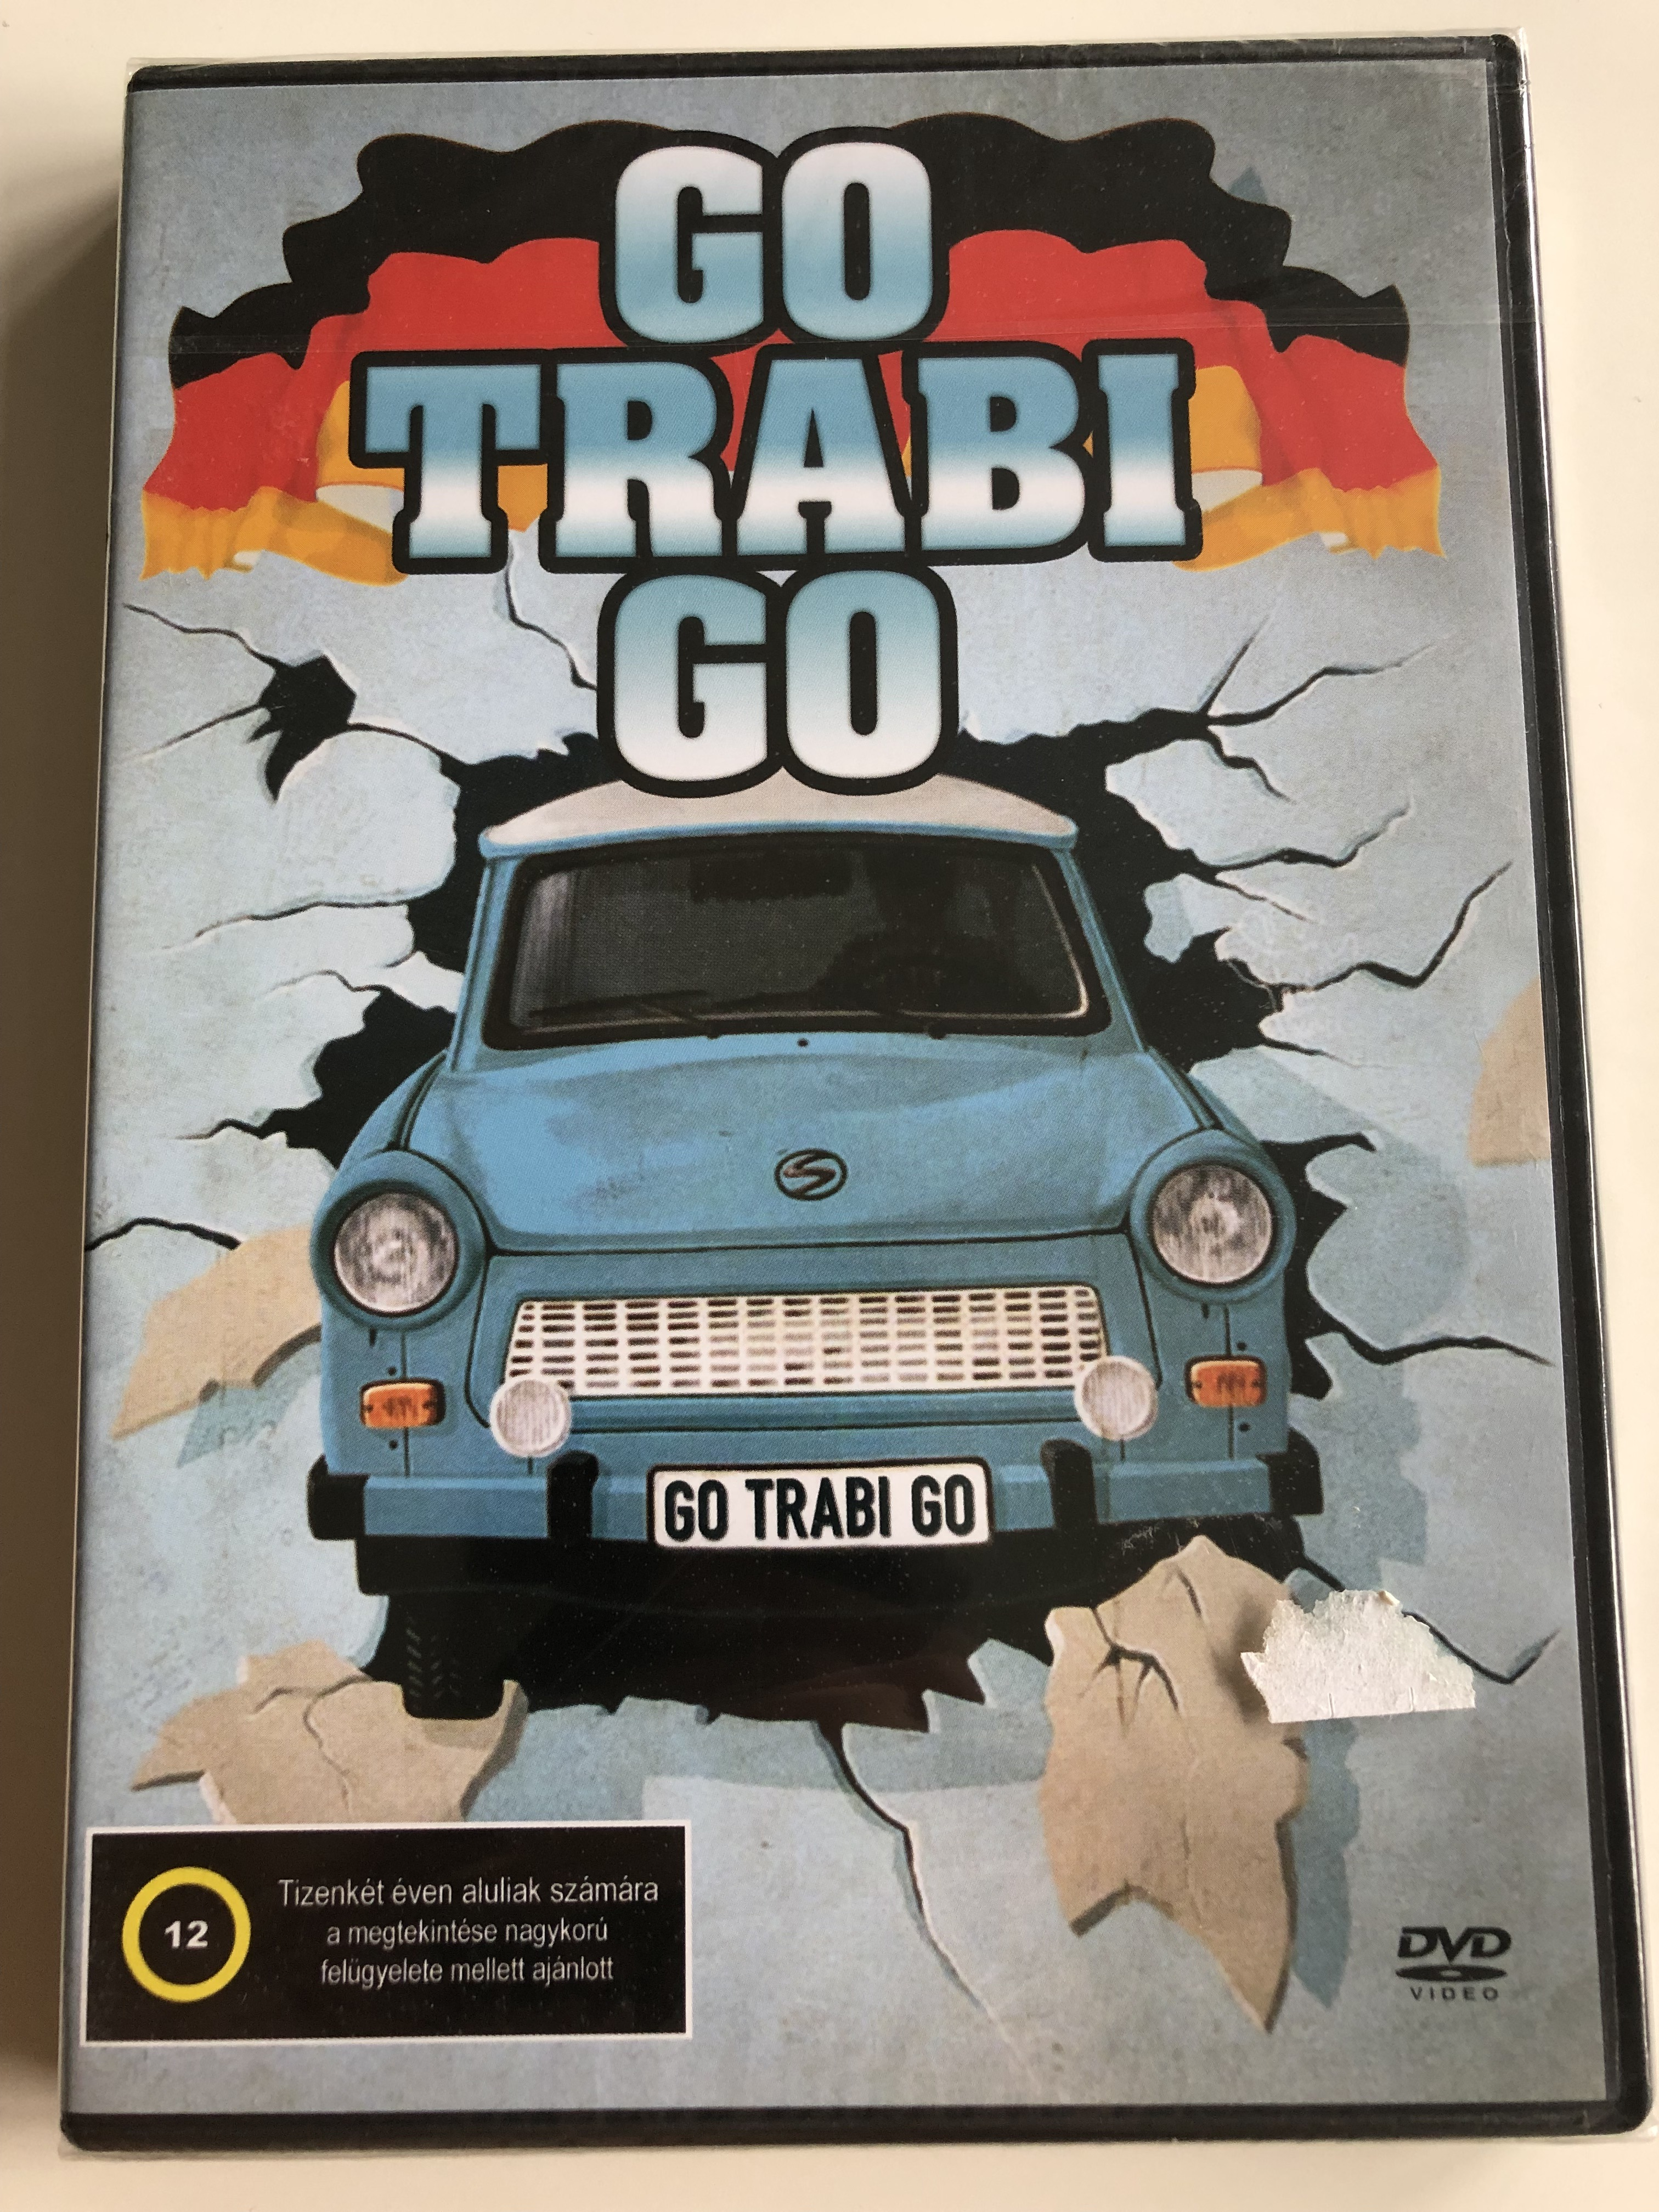 go-trabi-go-dvd-1991-directed-by-peter-timm-starring-wolfgang-stumph-claudia-schmutzler-marie-gruber-dieter-hildebrandt-ottfried-fischer-1-.jpg